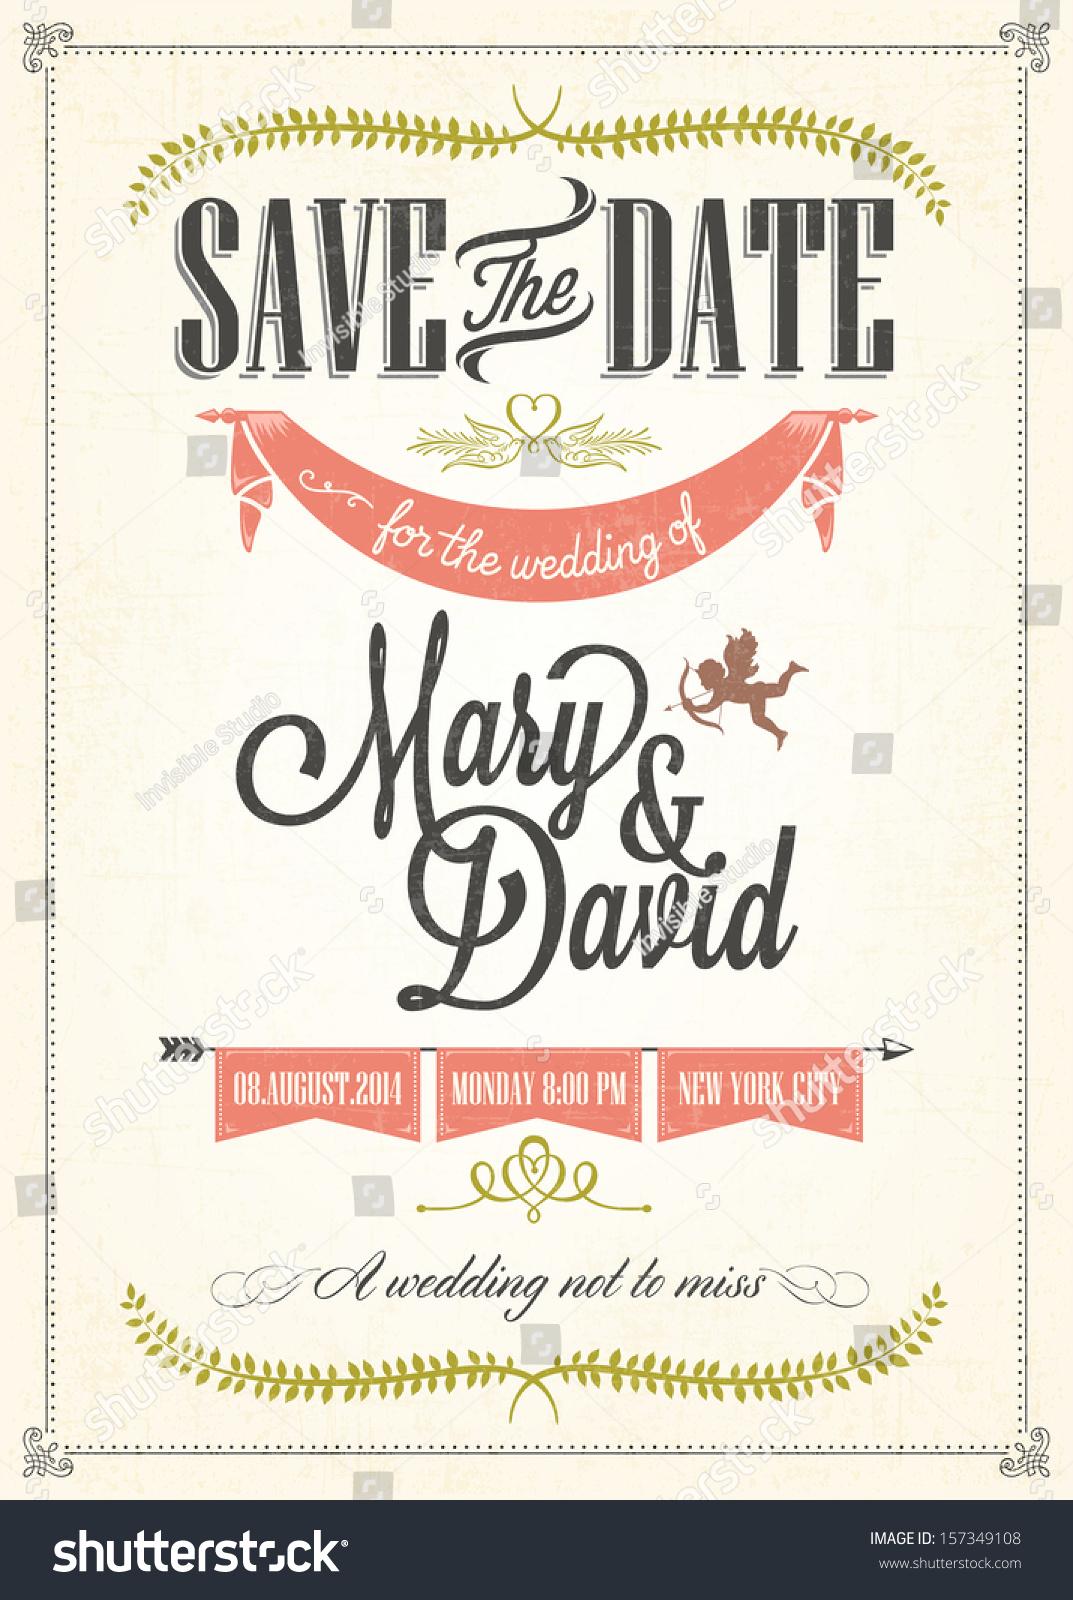 Christian Wedding Invitation Wording 35 Amazing Save the date wedding